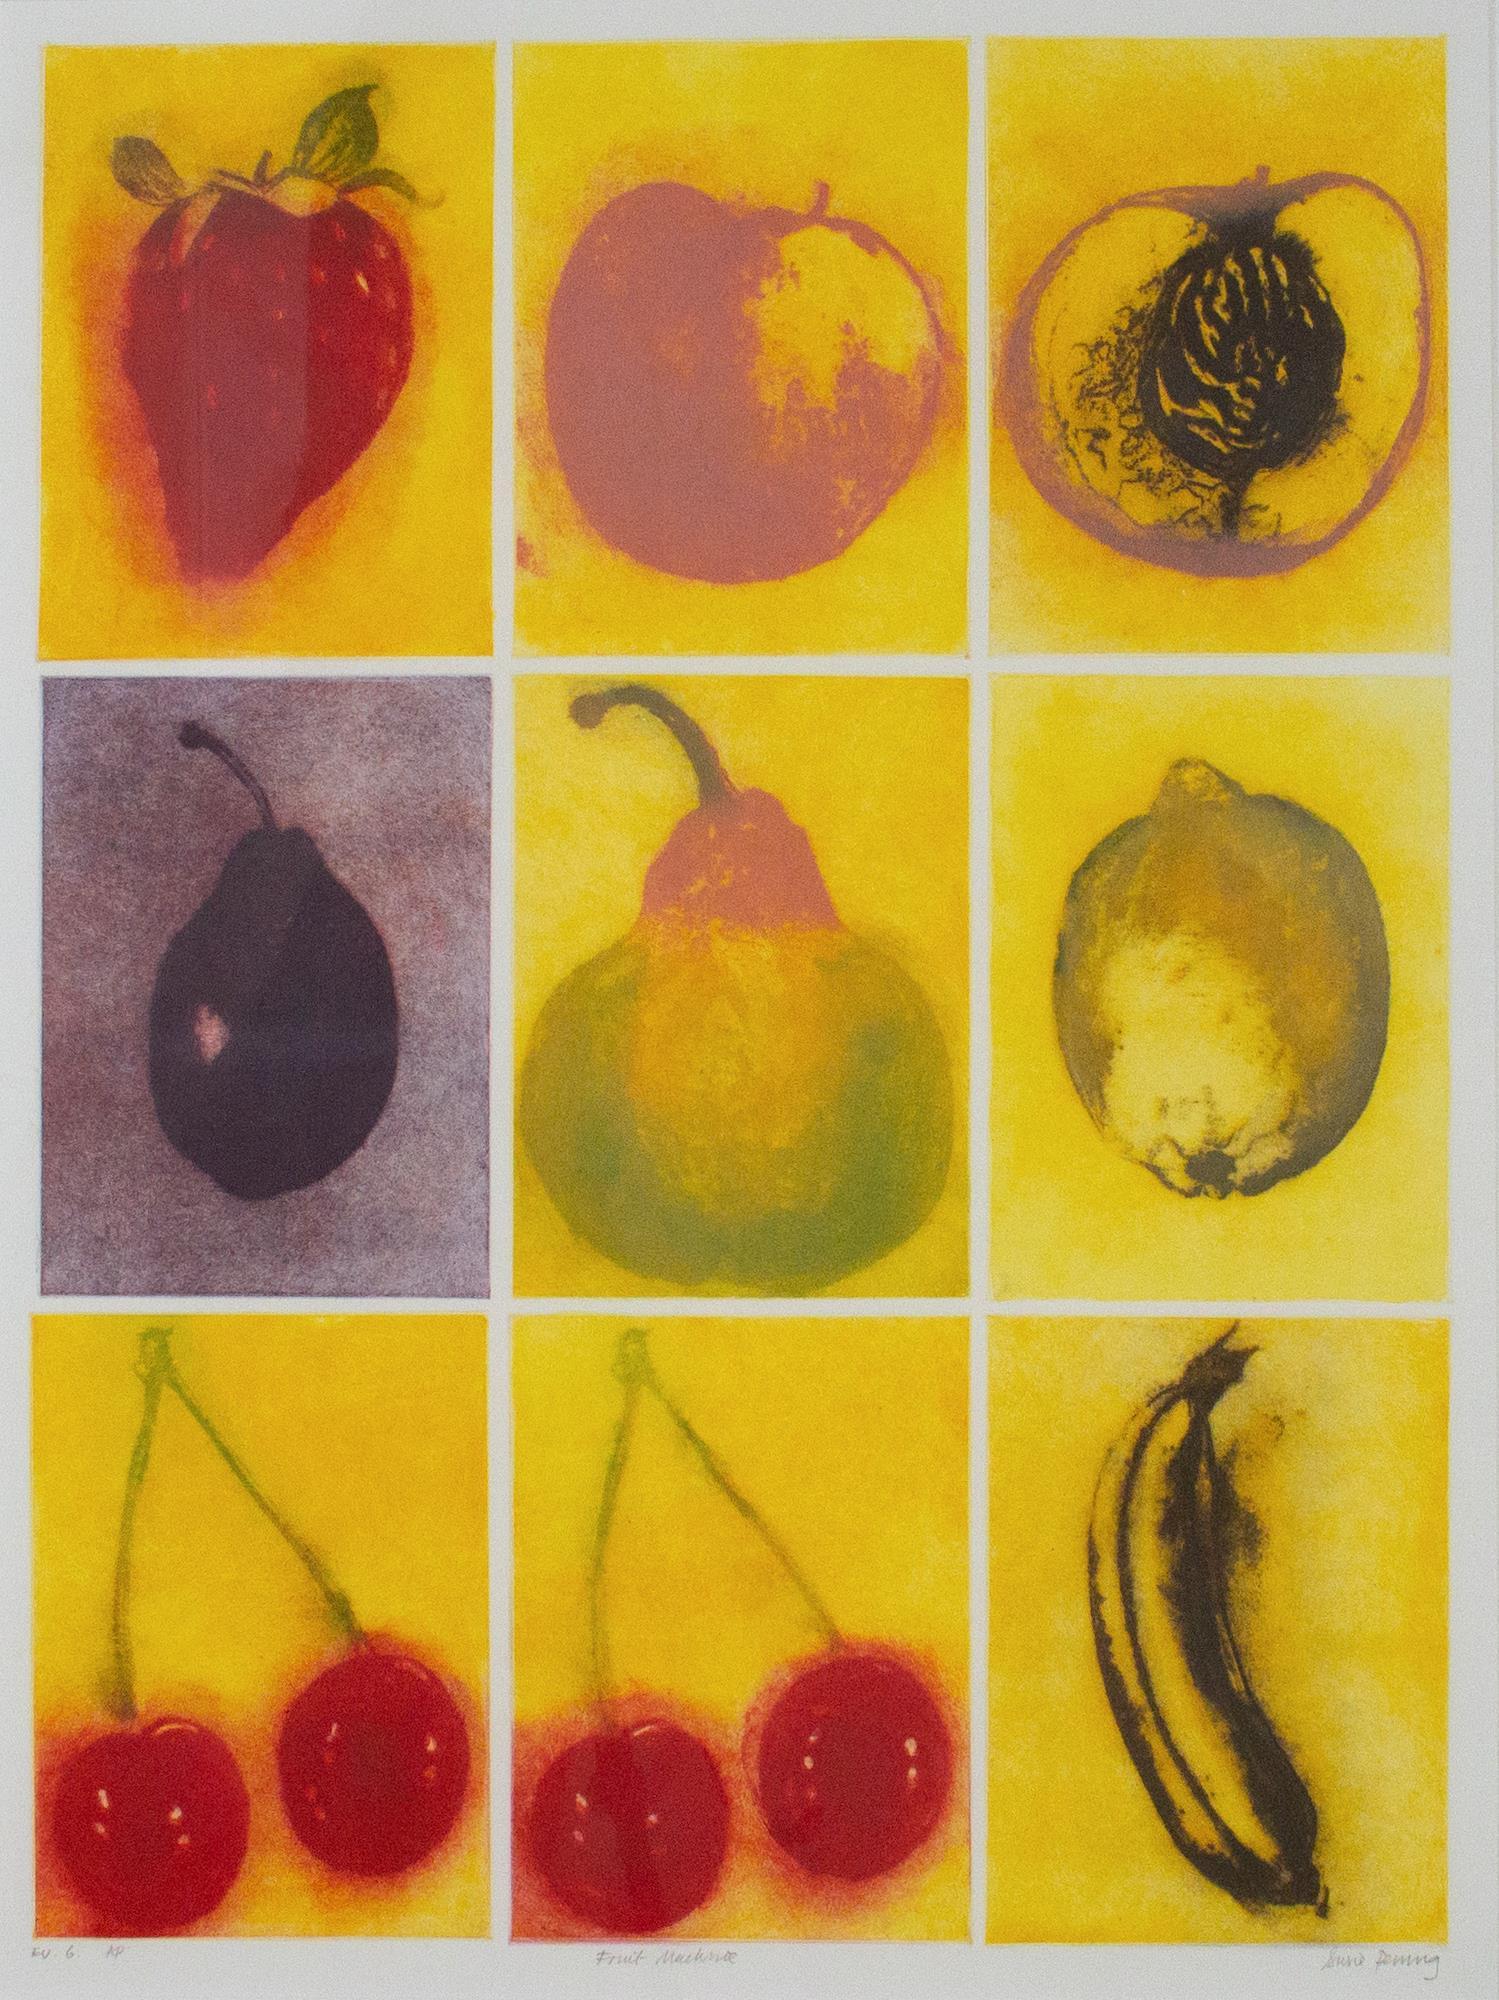 Fruit Machine - Perring, Susie - k-11966